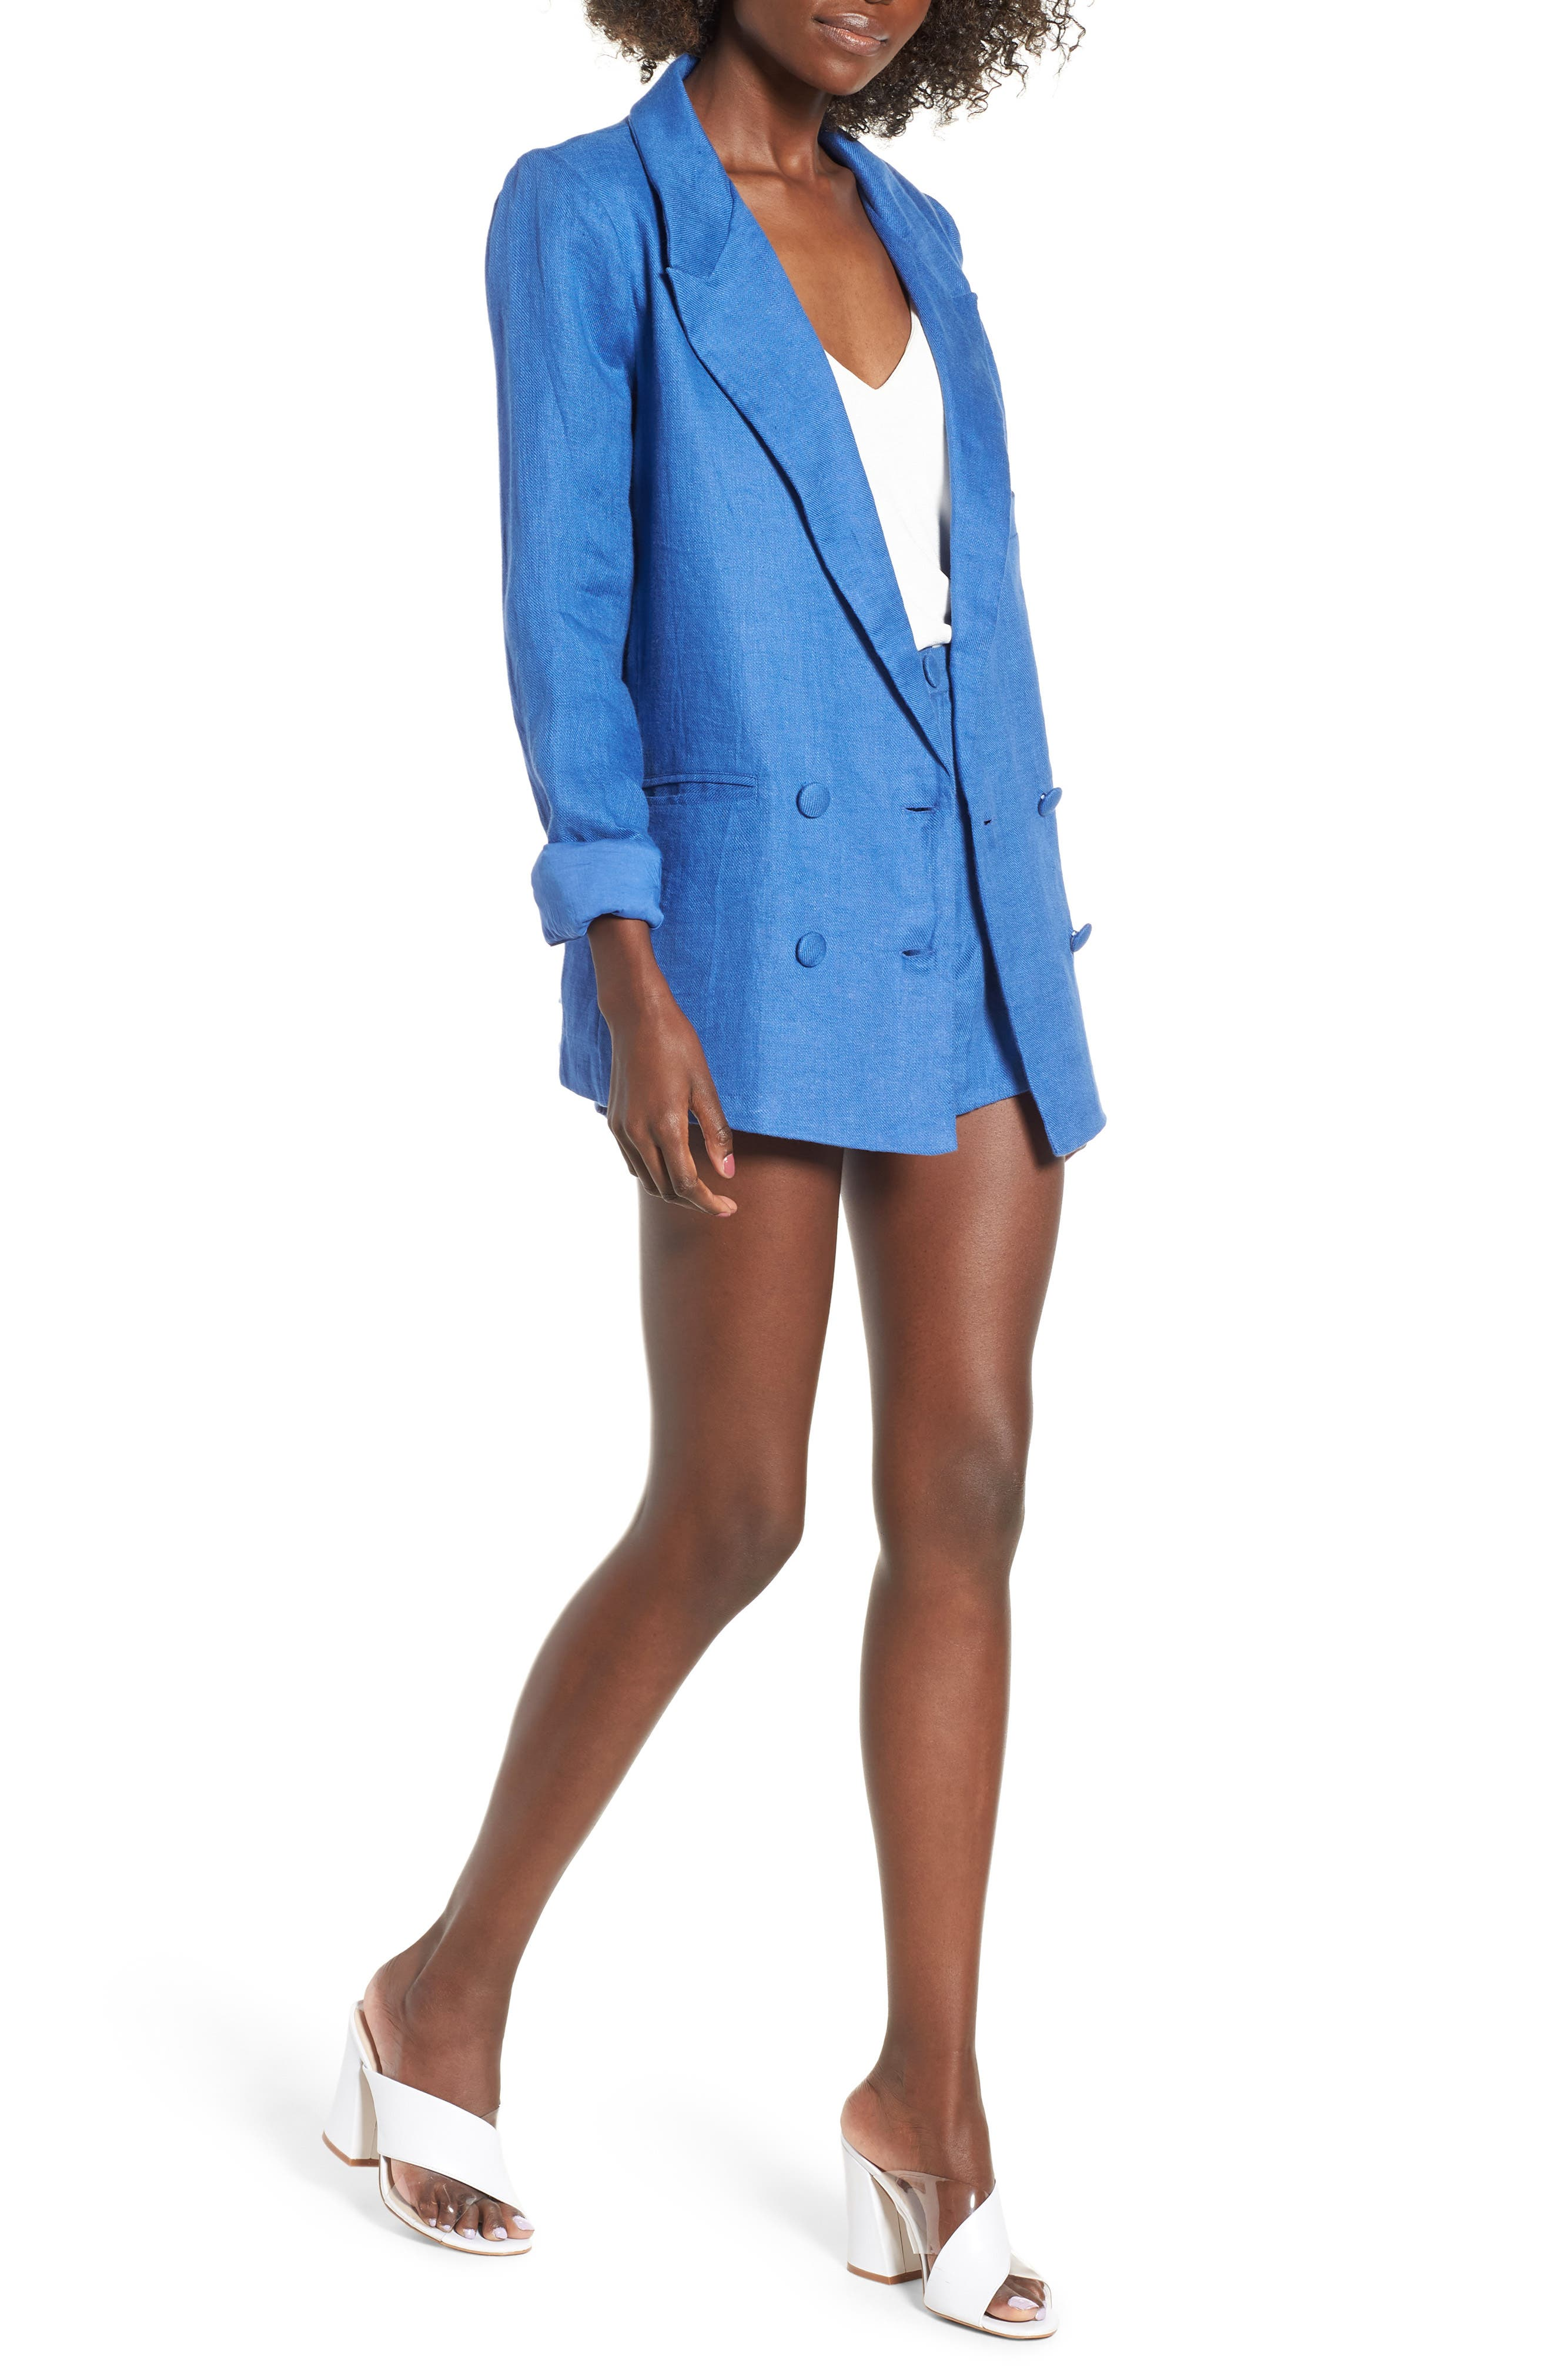 Jordy High Waist Shorts,                             Alternate thumbnail 2, color,                             Blue